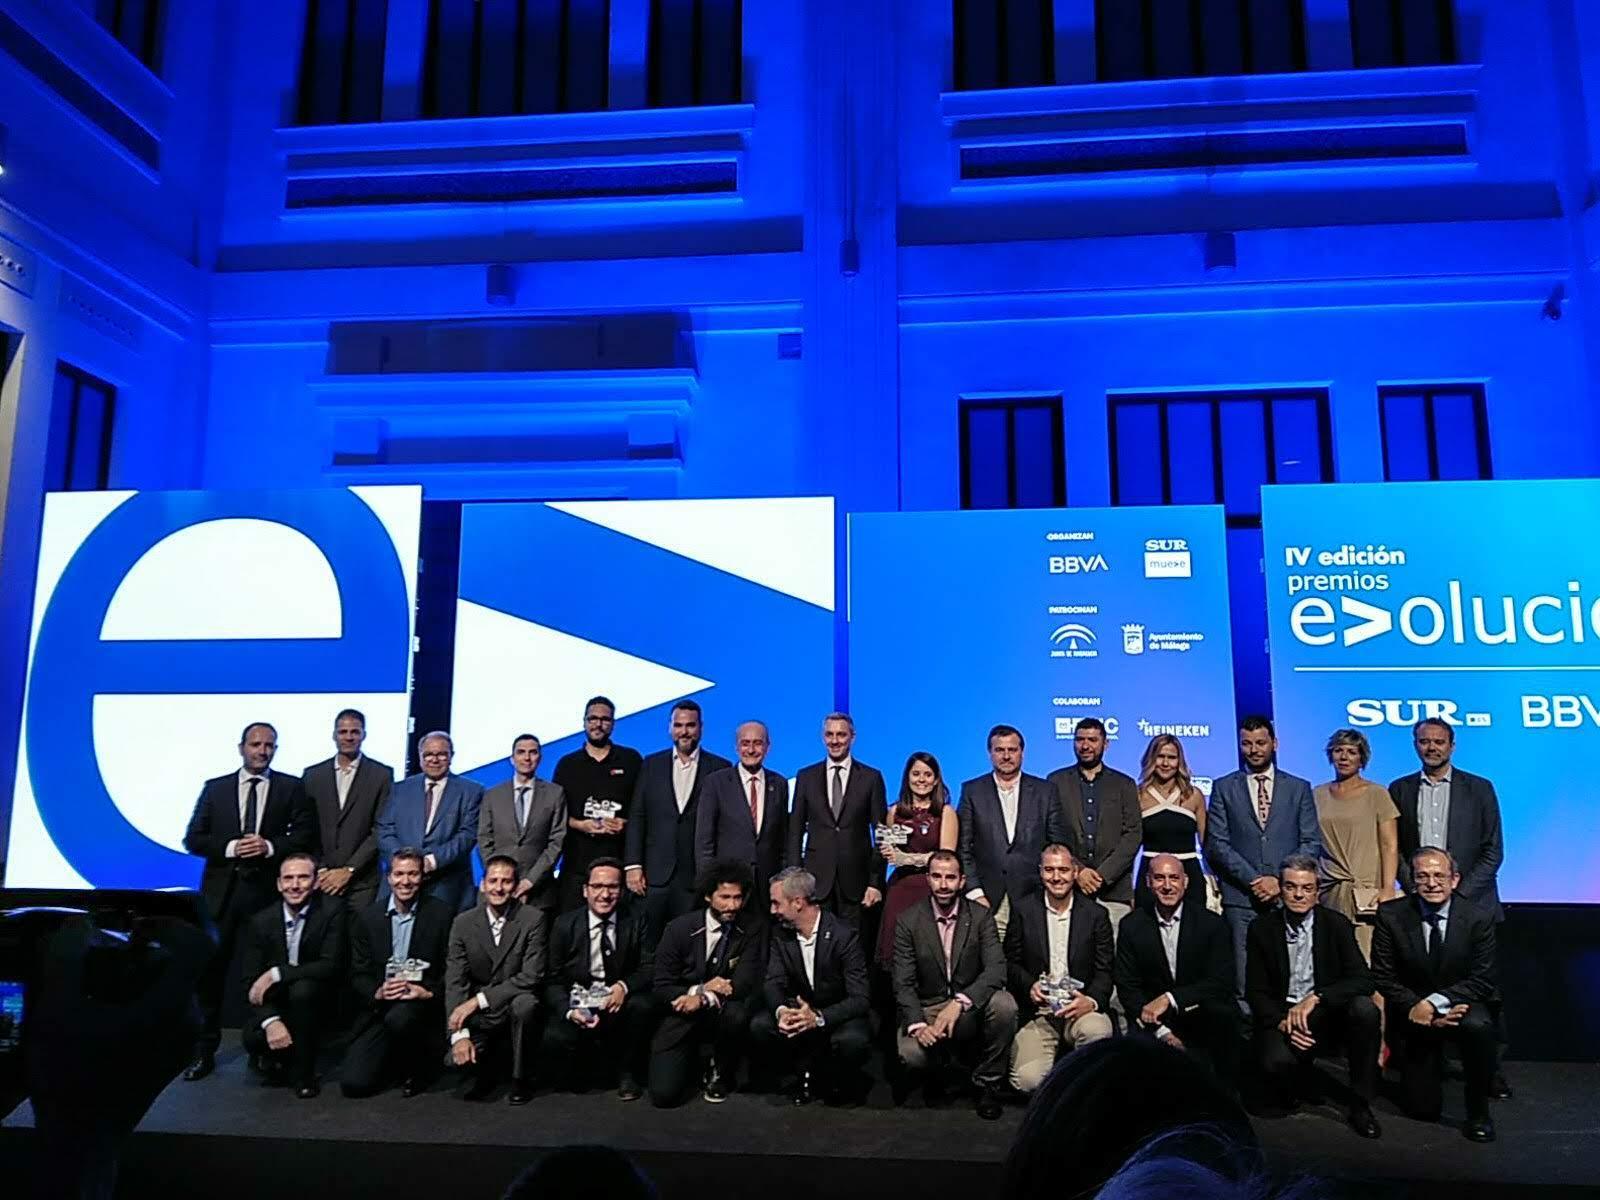 recogida de premios evolucion diario sur bbva lambda automotive